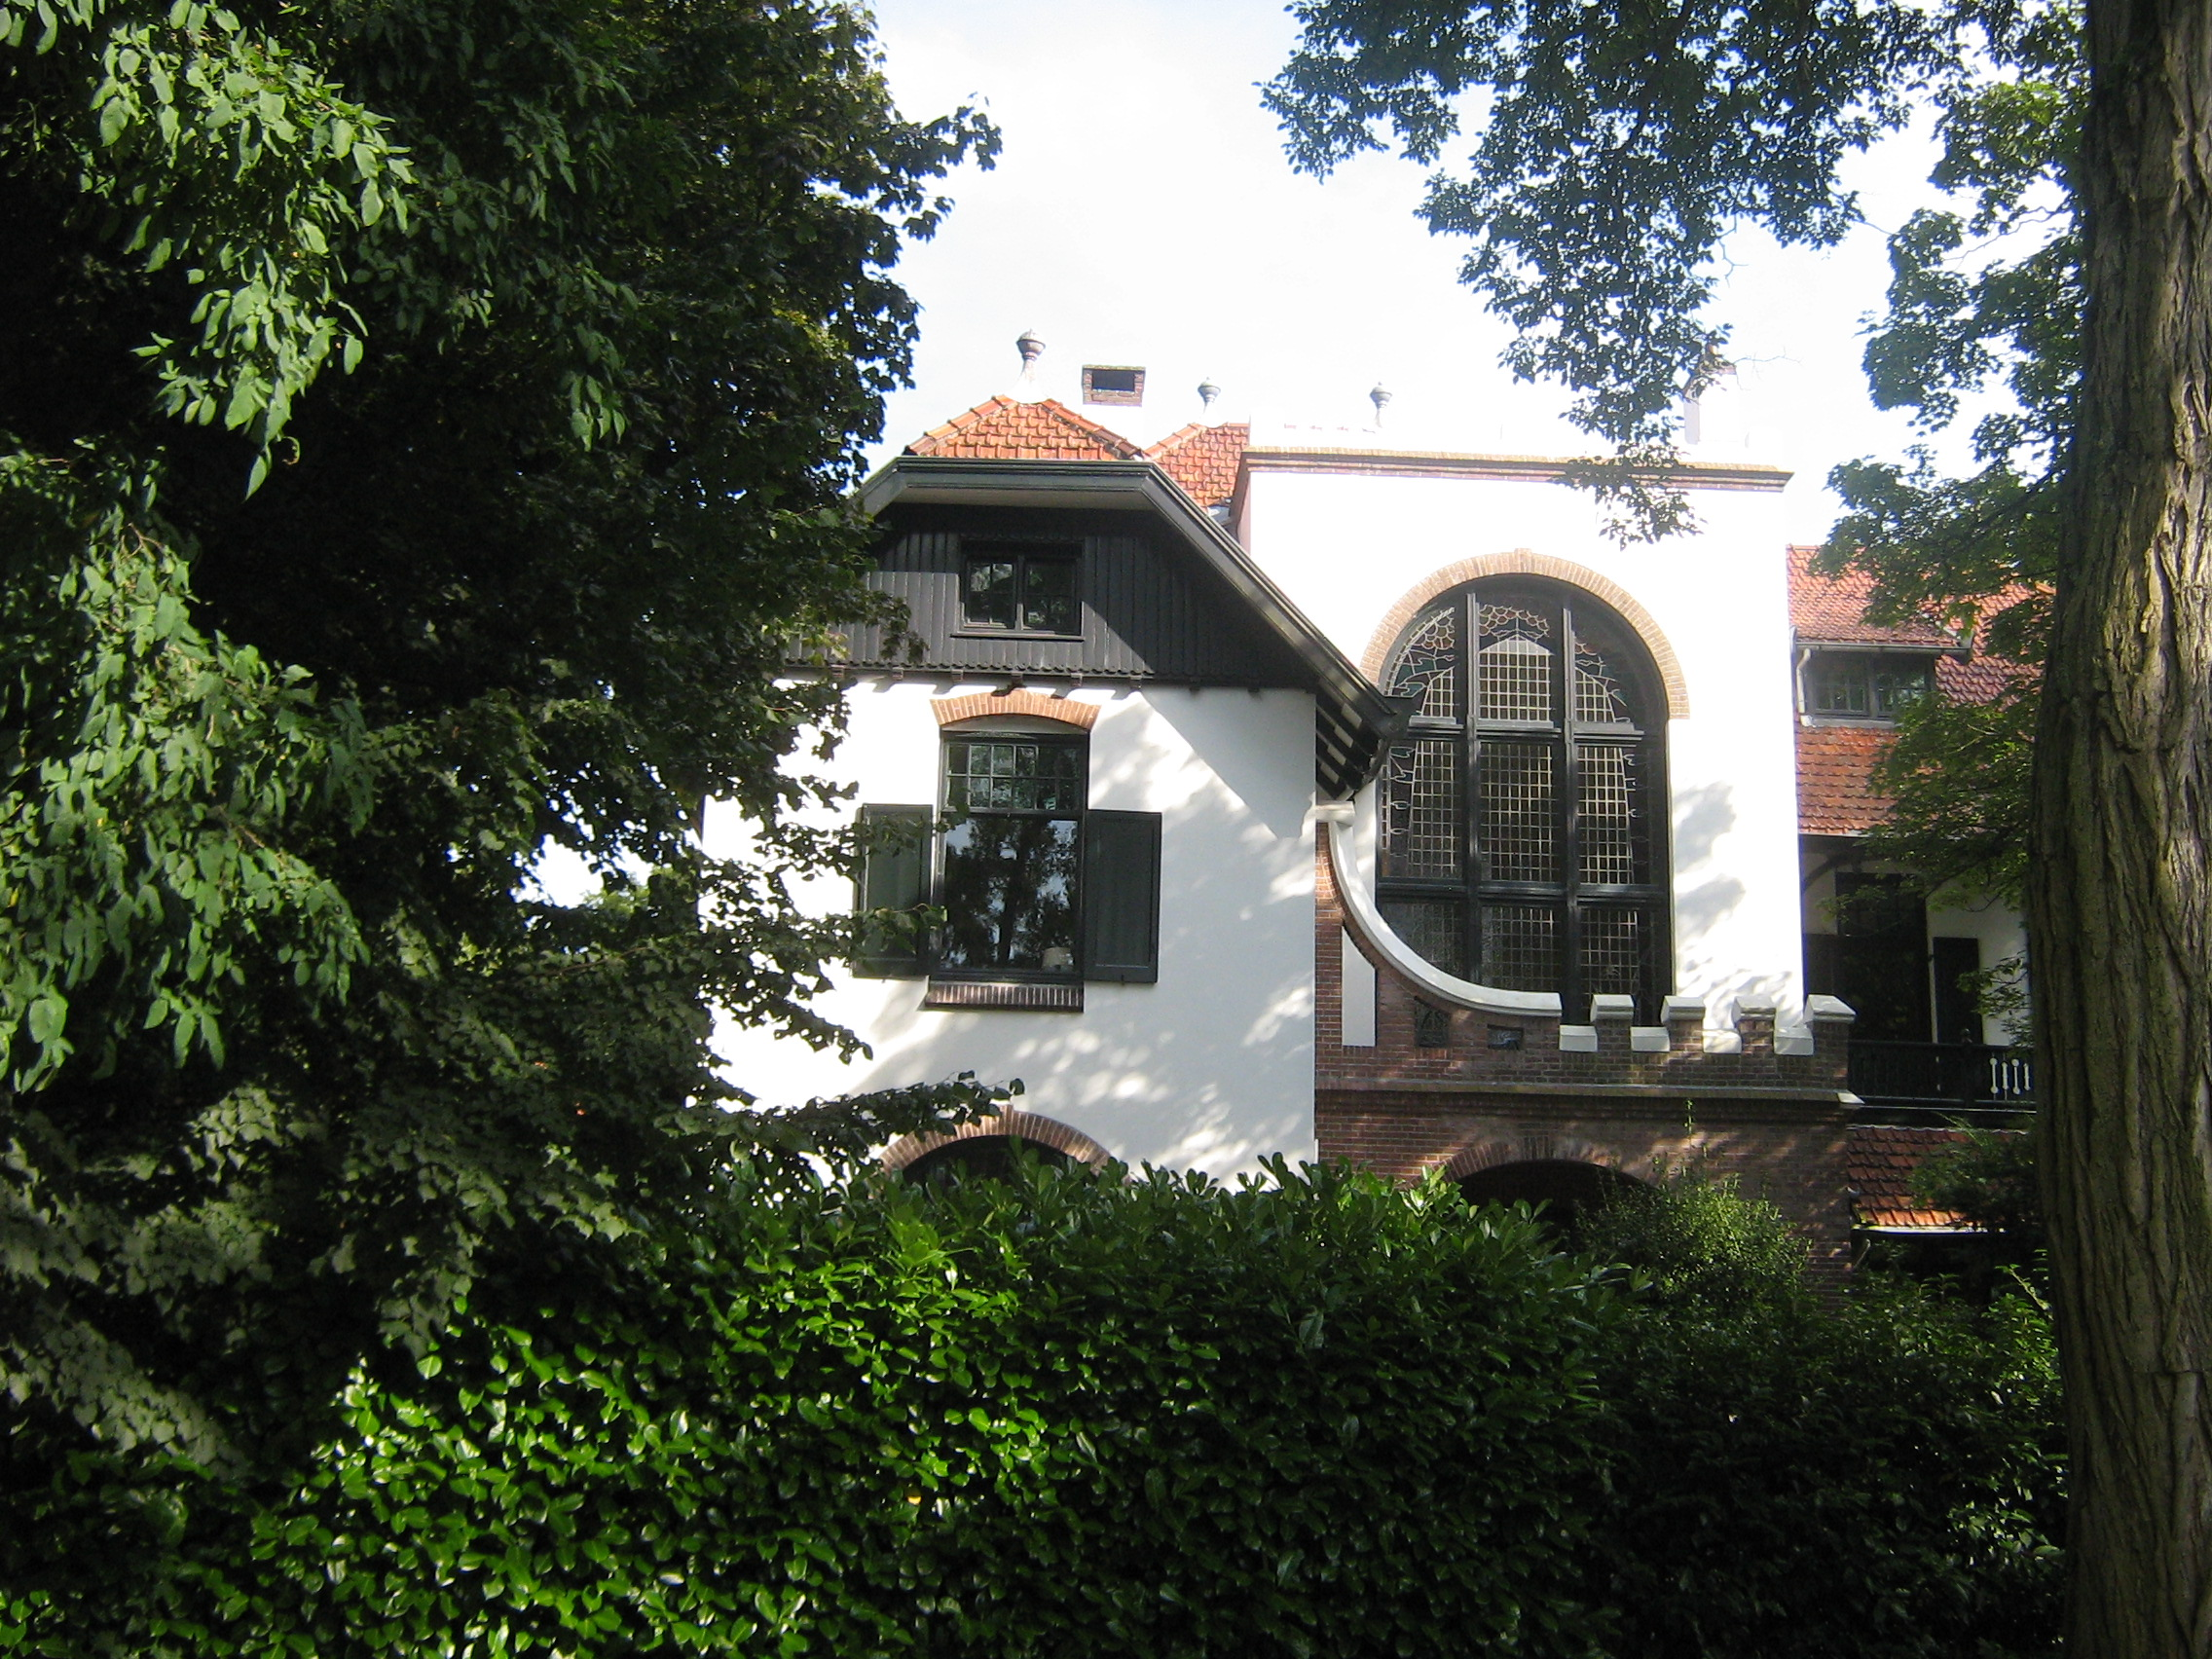 Villa gebouwd in art nouveau stijl met chalet stijl elementen in